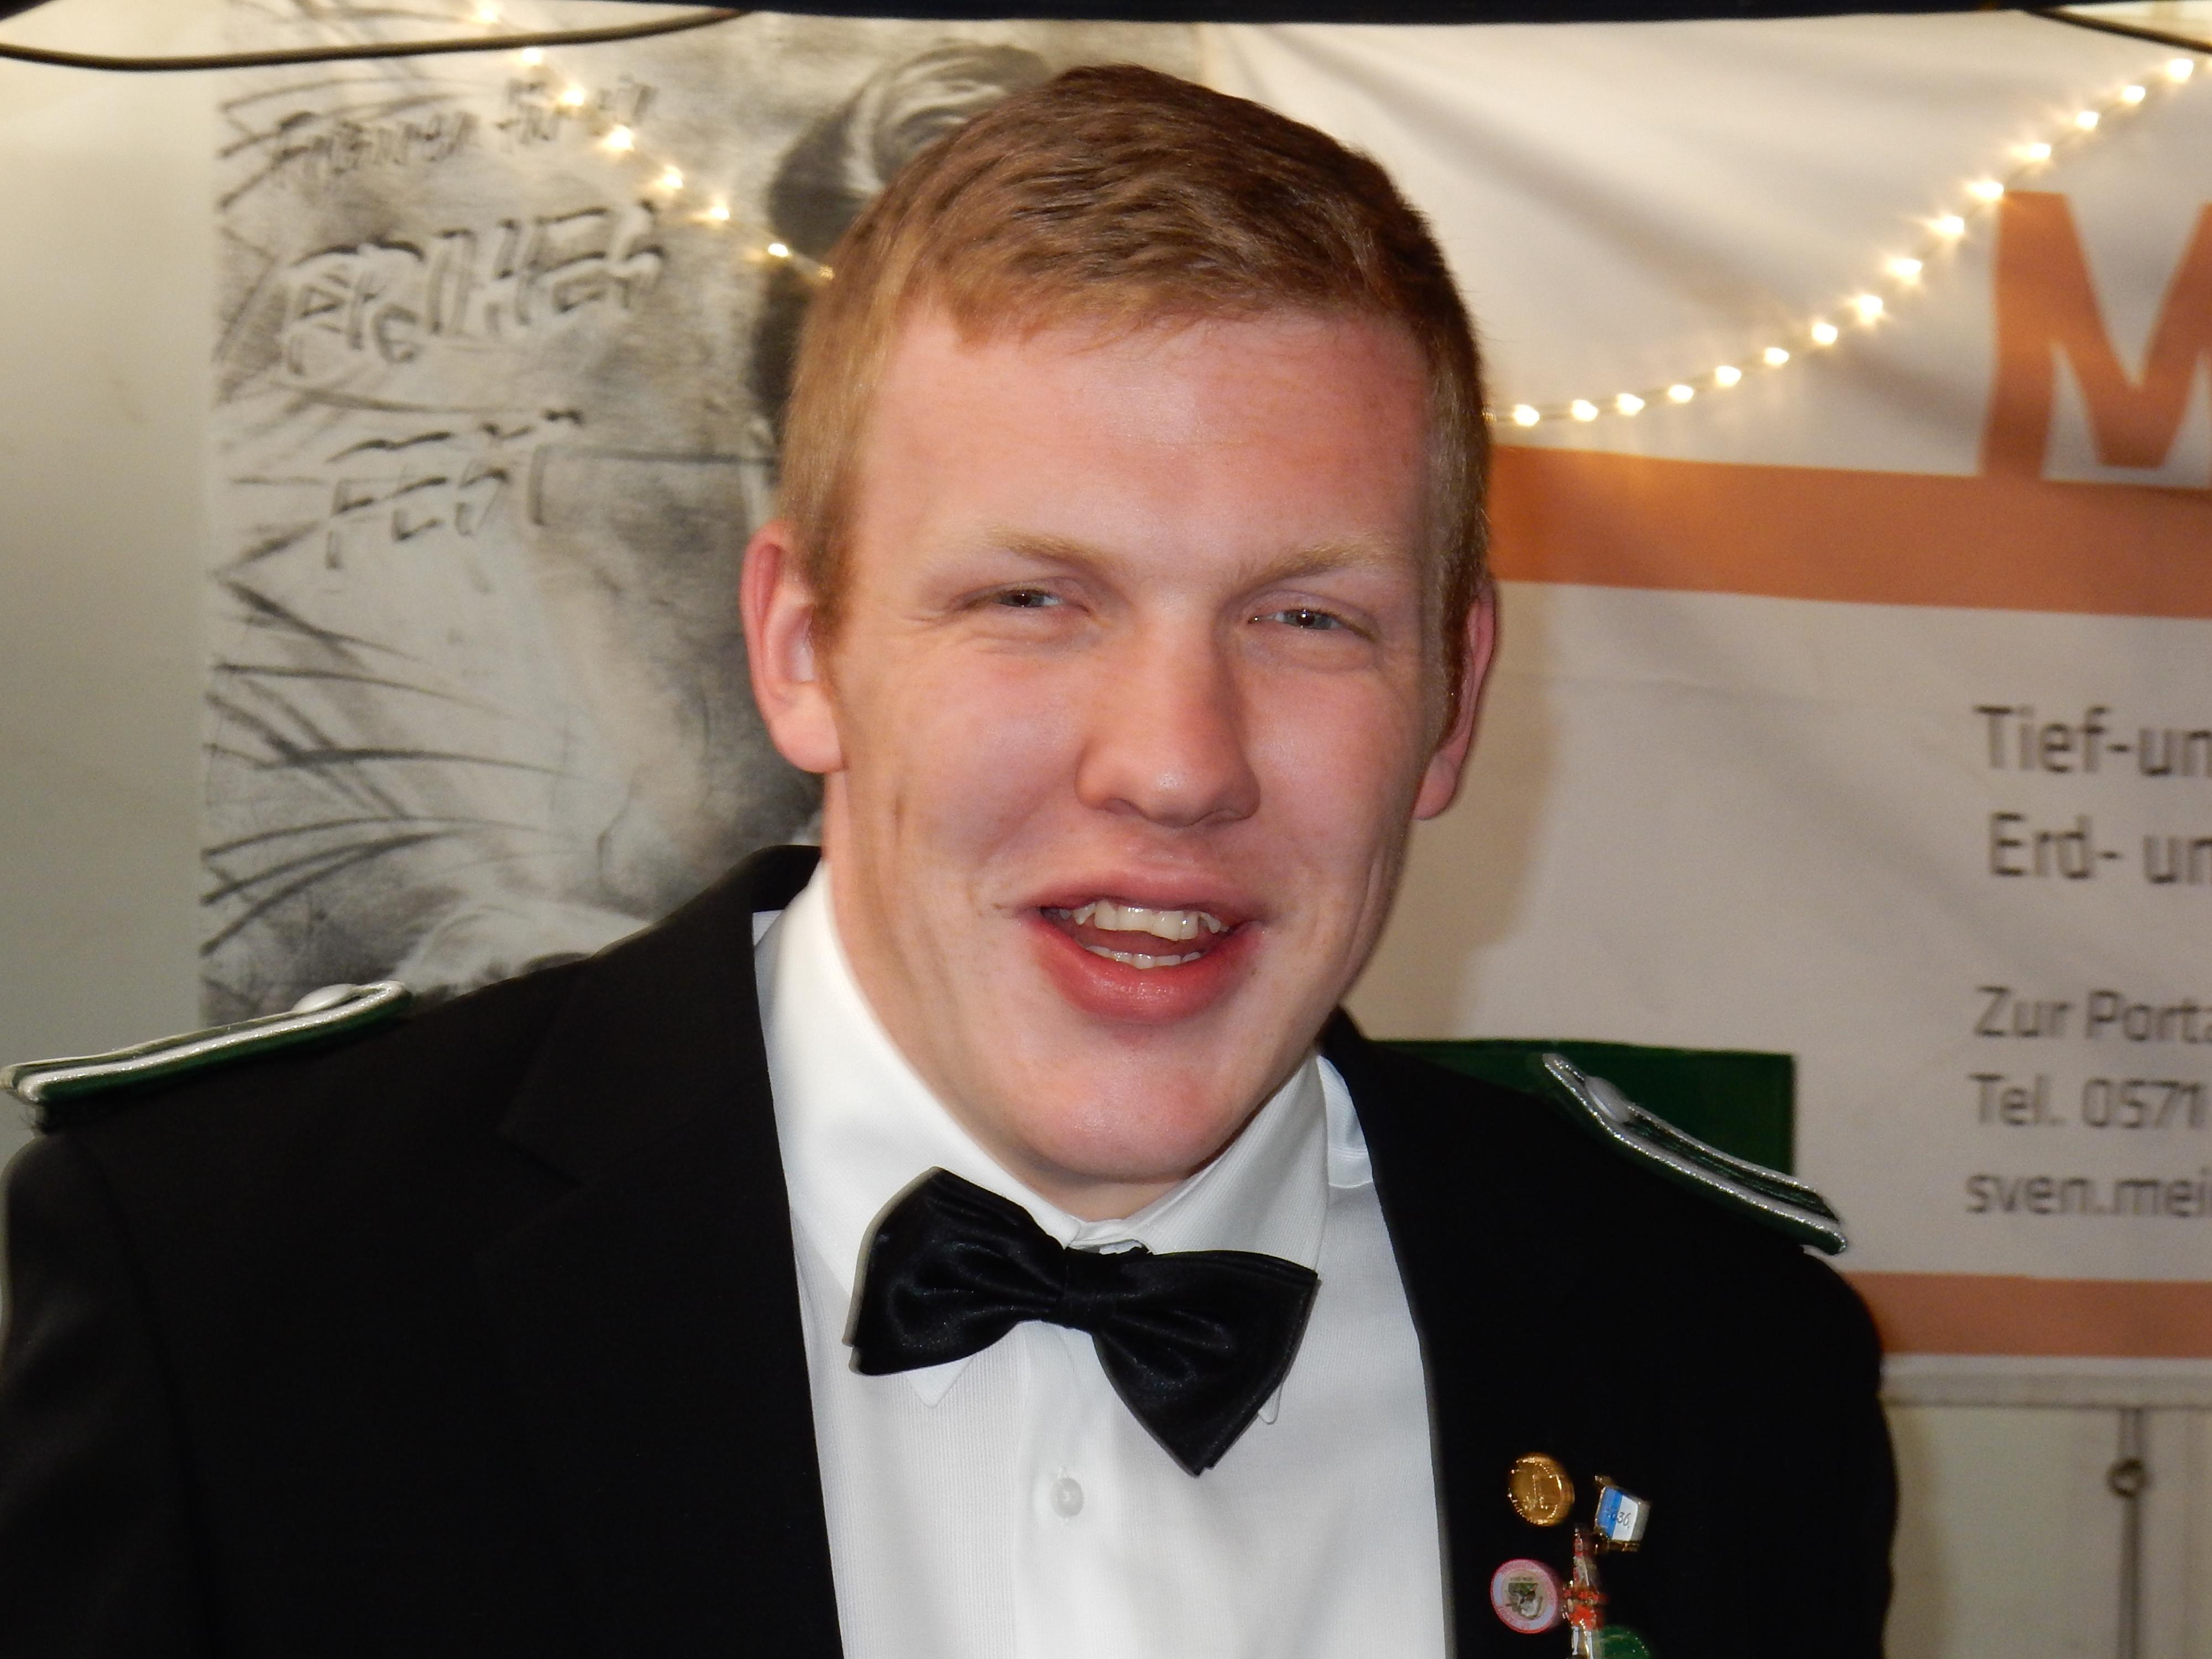 Christian Hö.